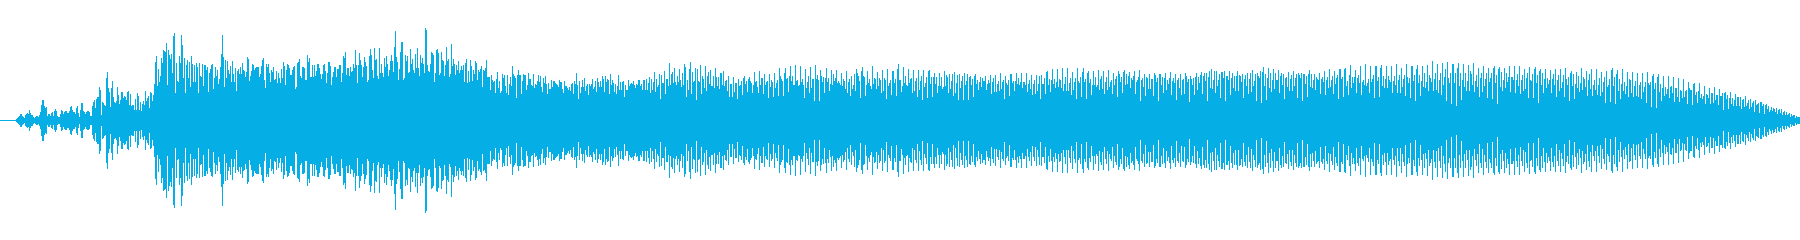 ASMR 電動マッサージ機を使うの再生済みの波形